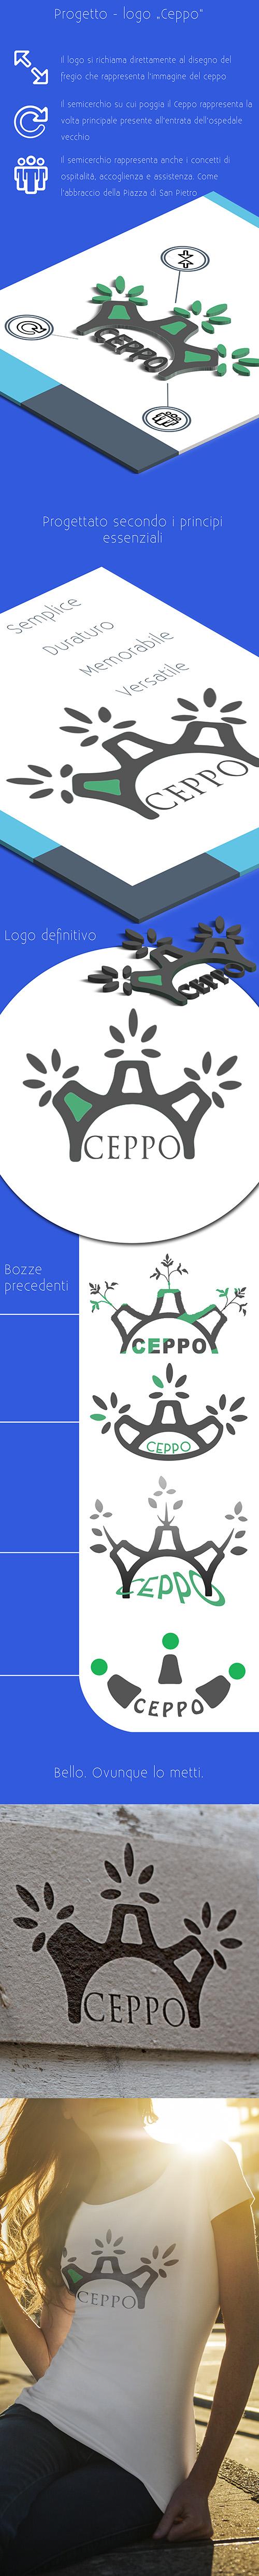 creare un logo online gratis